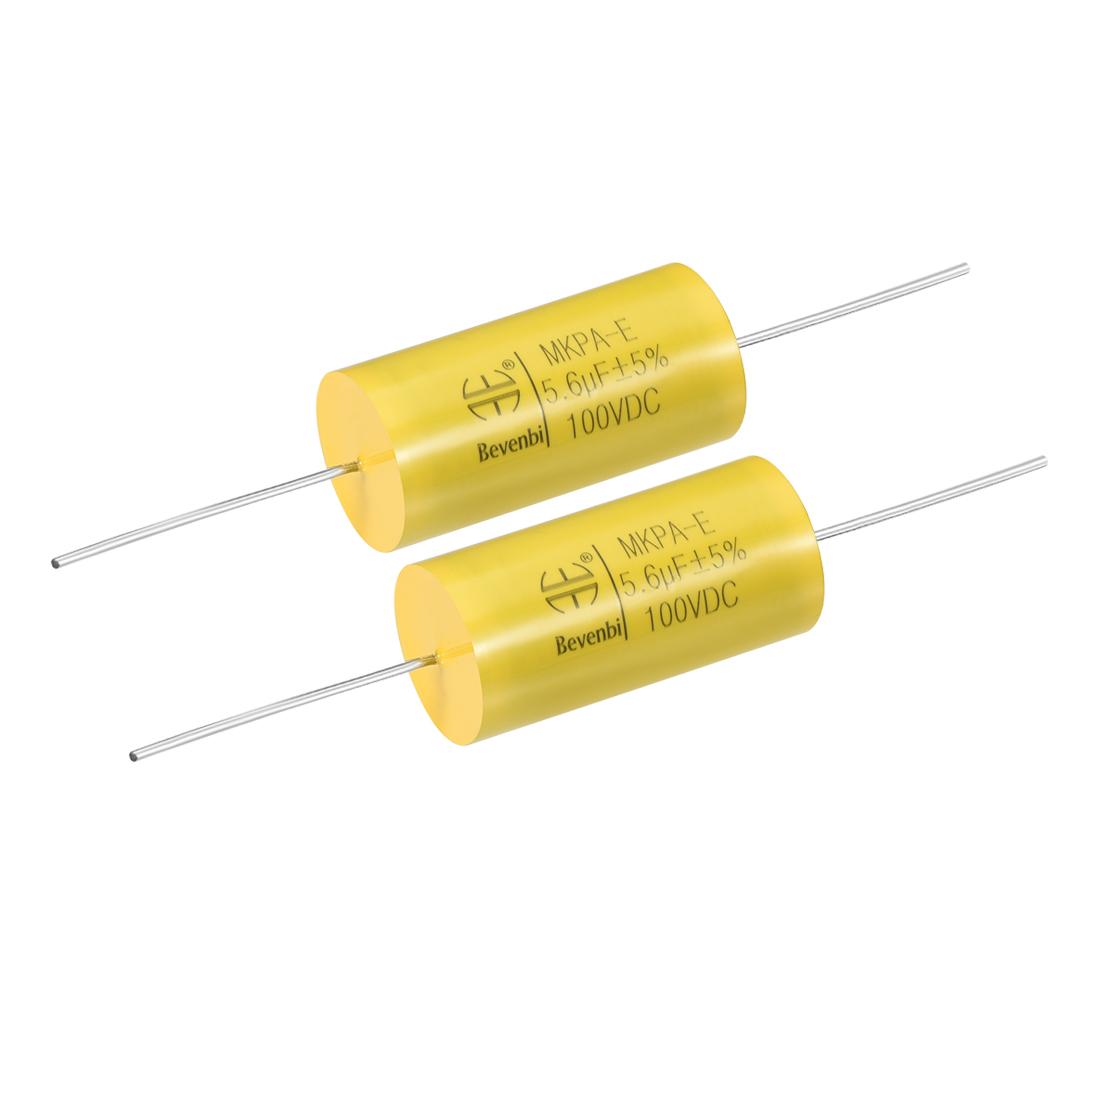 Film Capacitor 100V DC 5.6uF MKPA-E Round Polypropylene Capacitors Yellow 2pcs